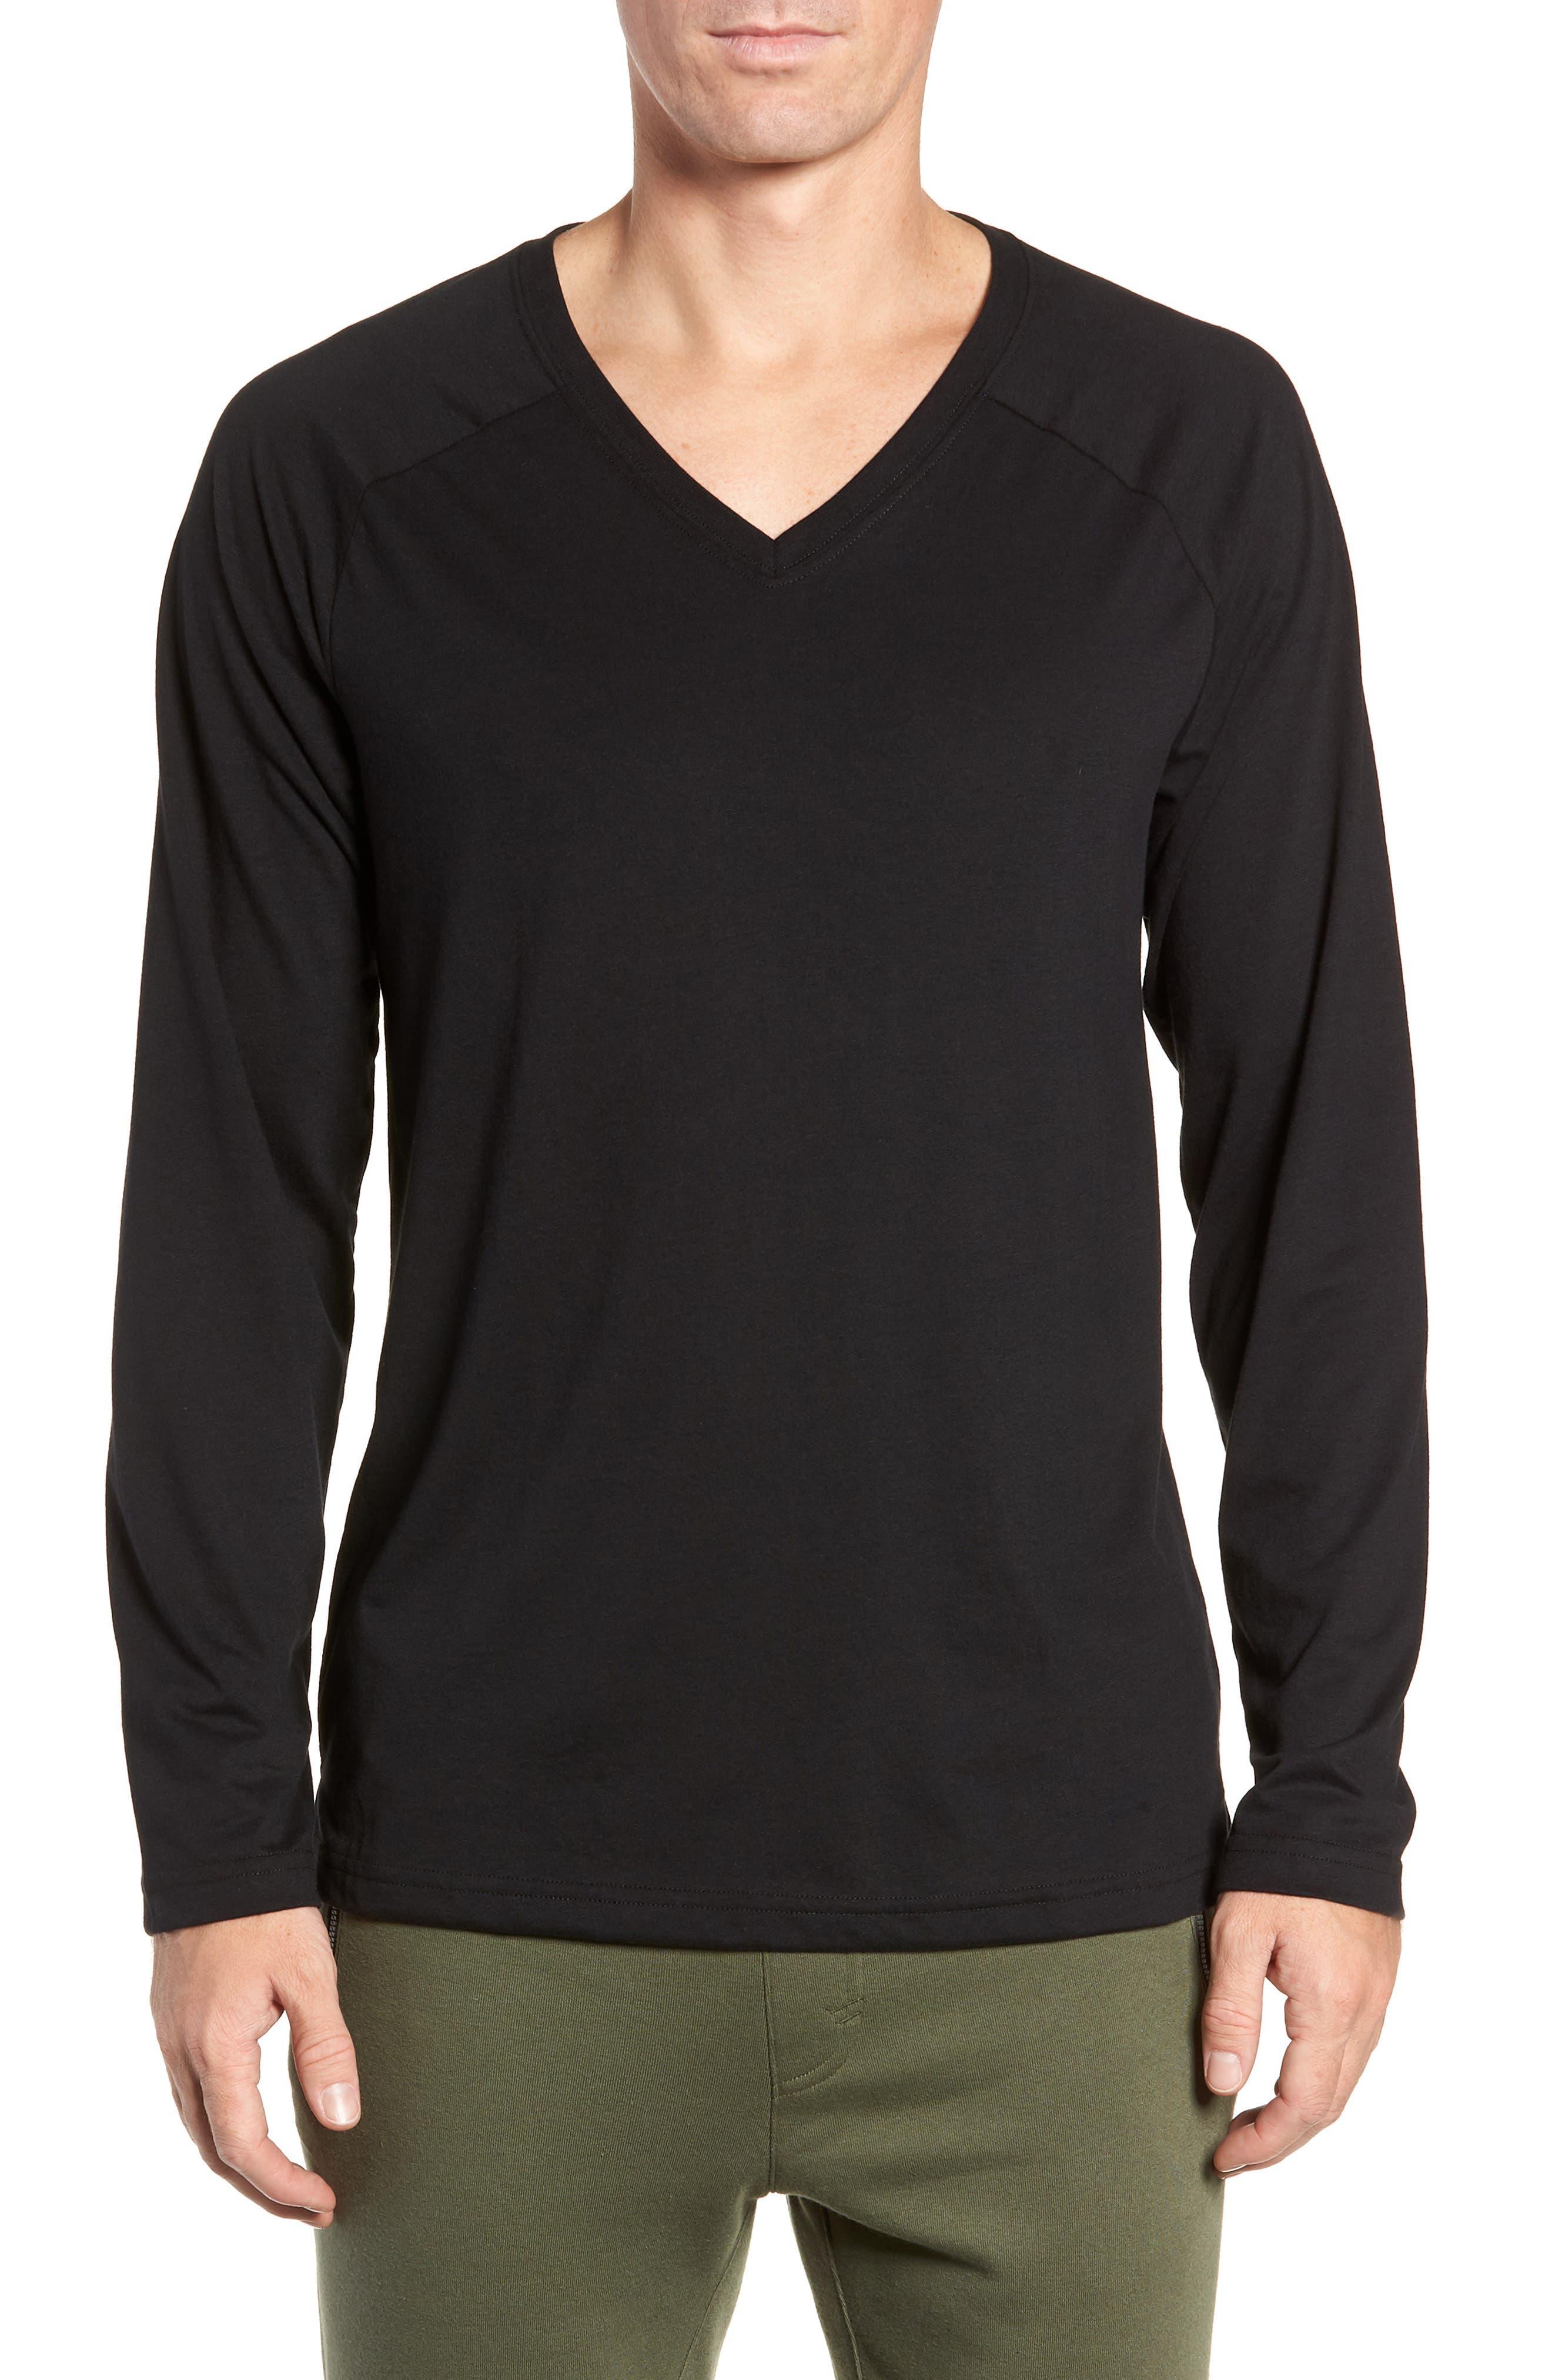 ALO Triumph Long Raglan Sleeve V-Neck T-Shirt, Main, color, SOLID BLACK TRIBLEND